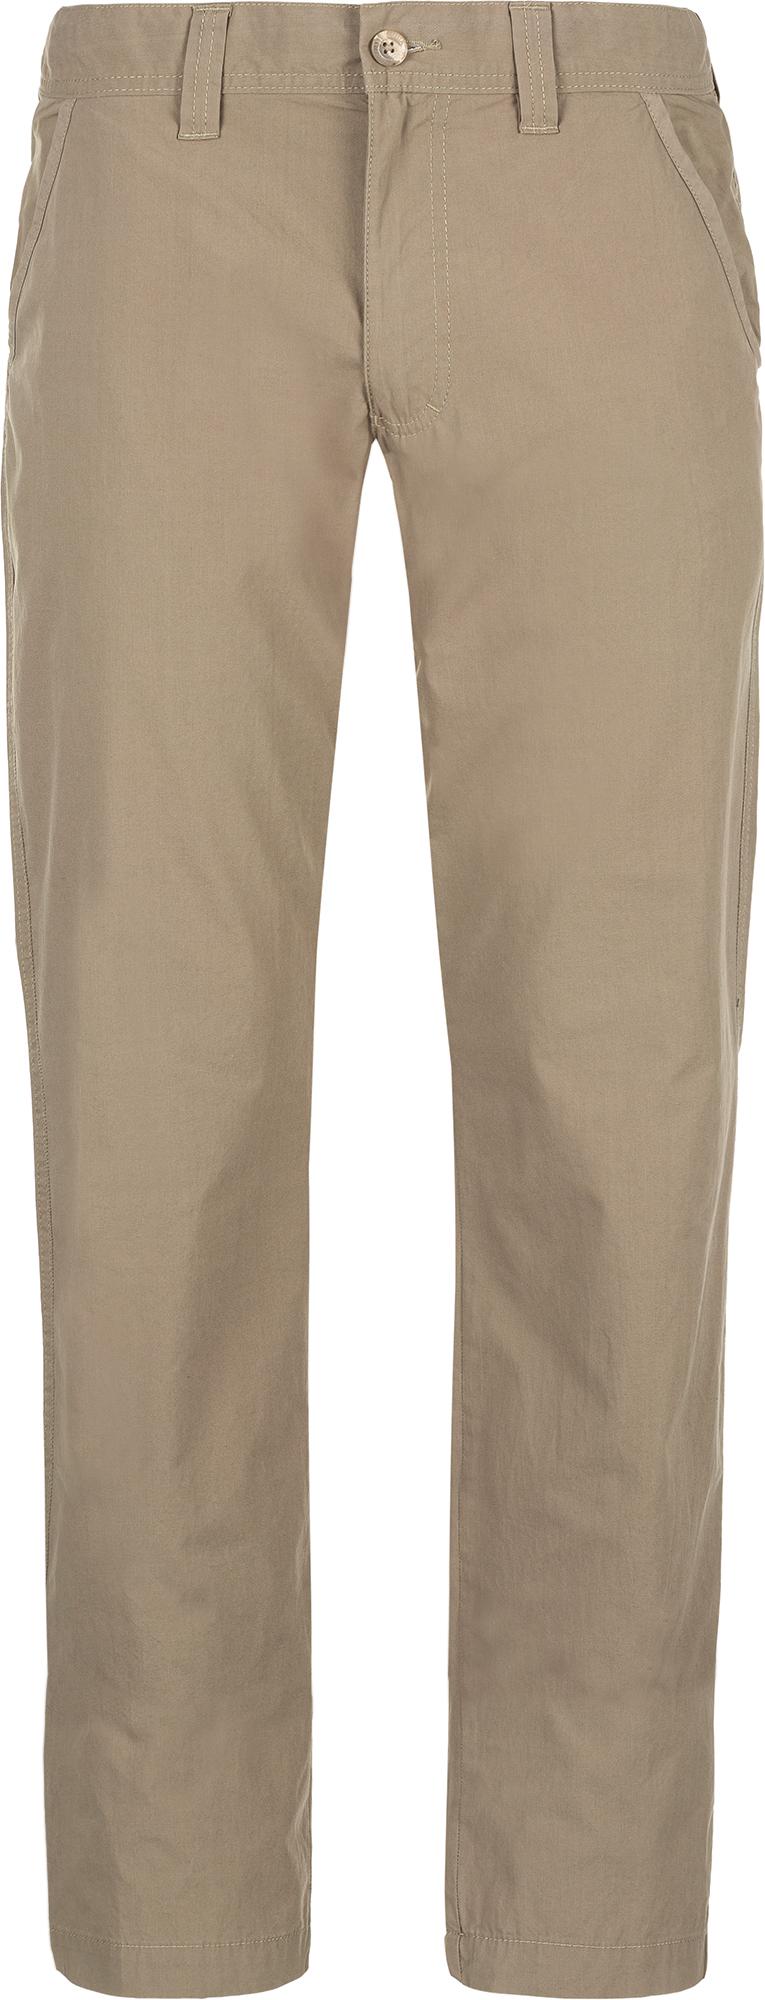 Columbia Брюки мужские Columbia Washed Out, размер 60-34 columbia брюки мужские columbia washed out